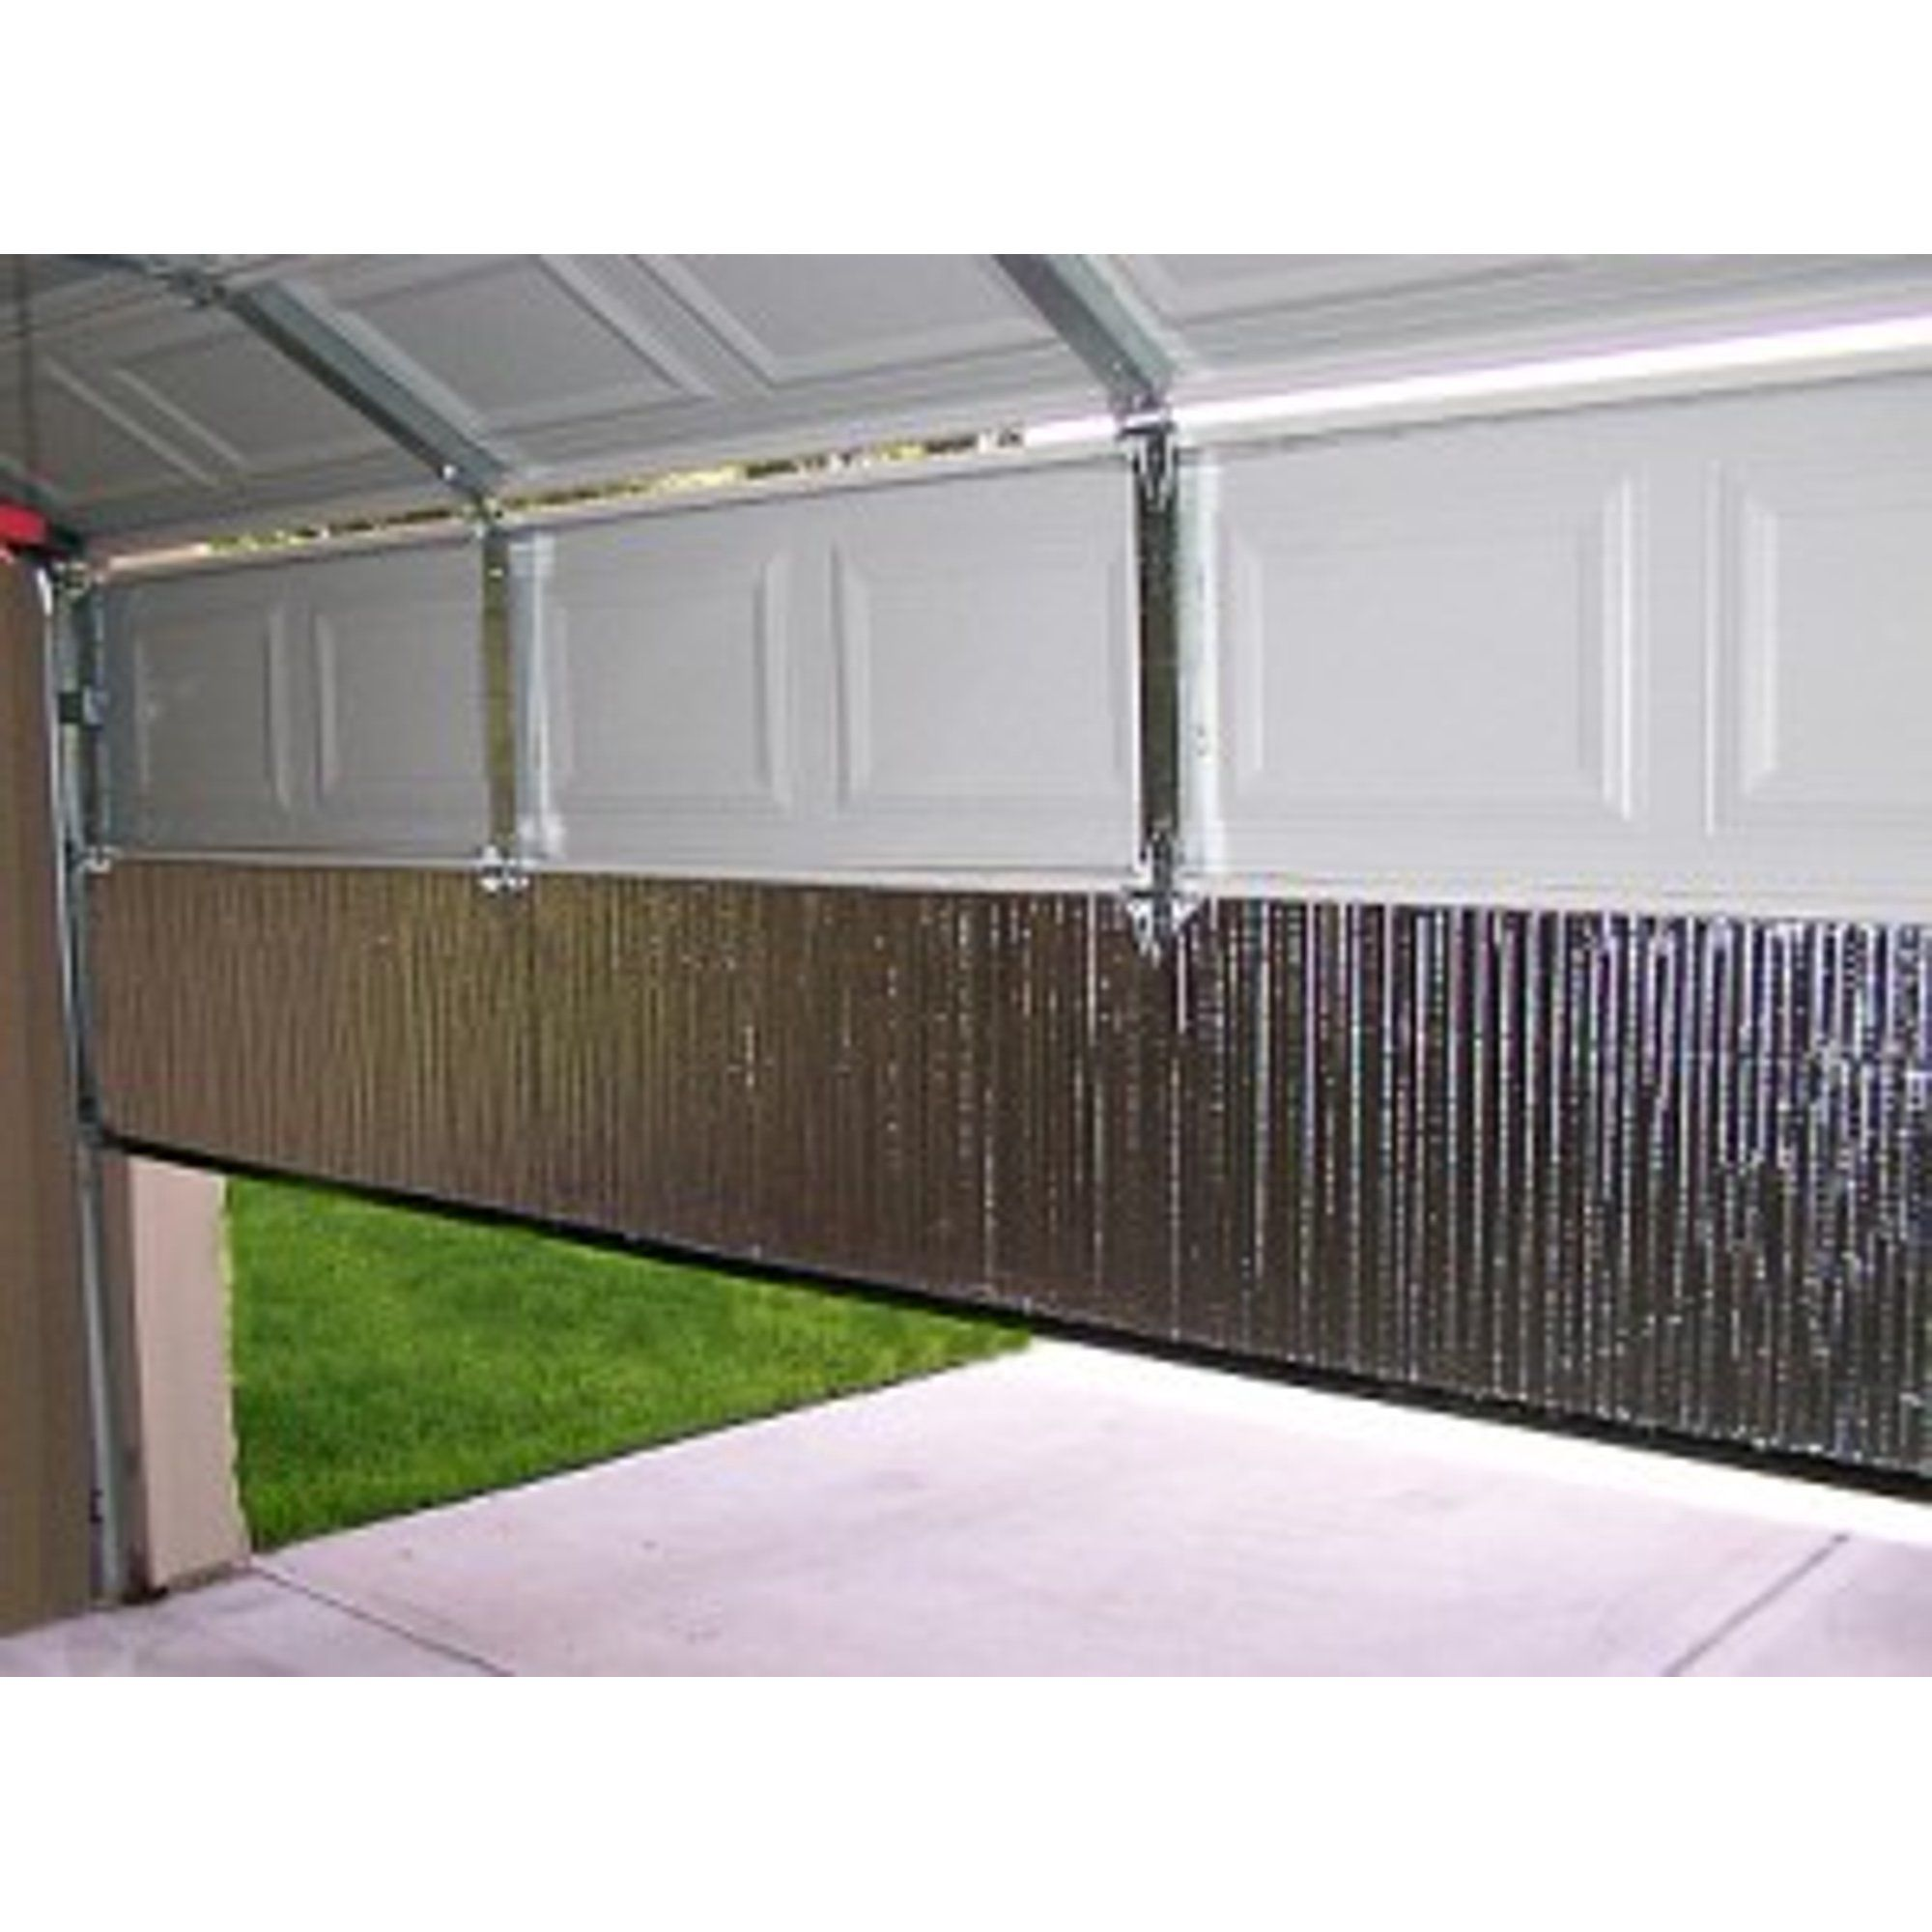 Pin on Garage door insulation kit